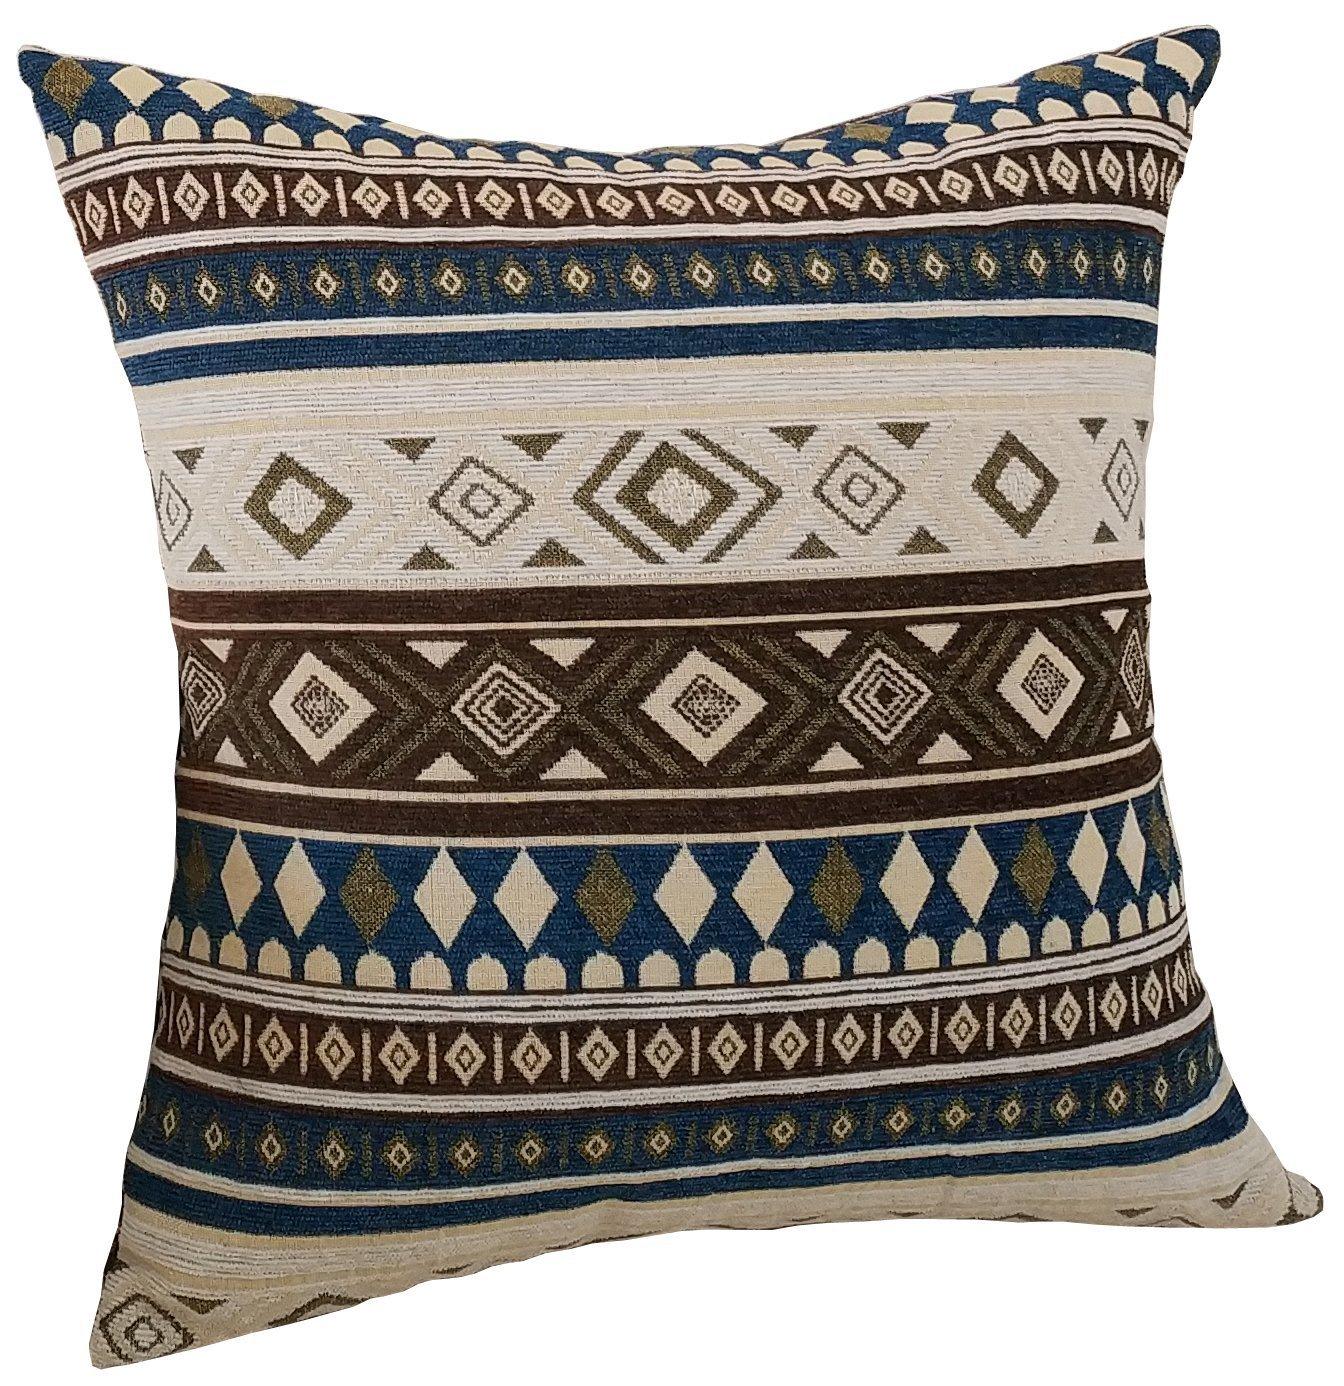 M MOCHOHOME Bohemian Style Retro Decorative Cotton/Linen Blend Geometric Square Euro Throw Pillow Cover Case Pillowcase Cushion Sham - 16'' x 16'', Coffee/Beige/Blue